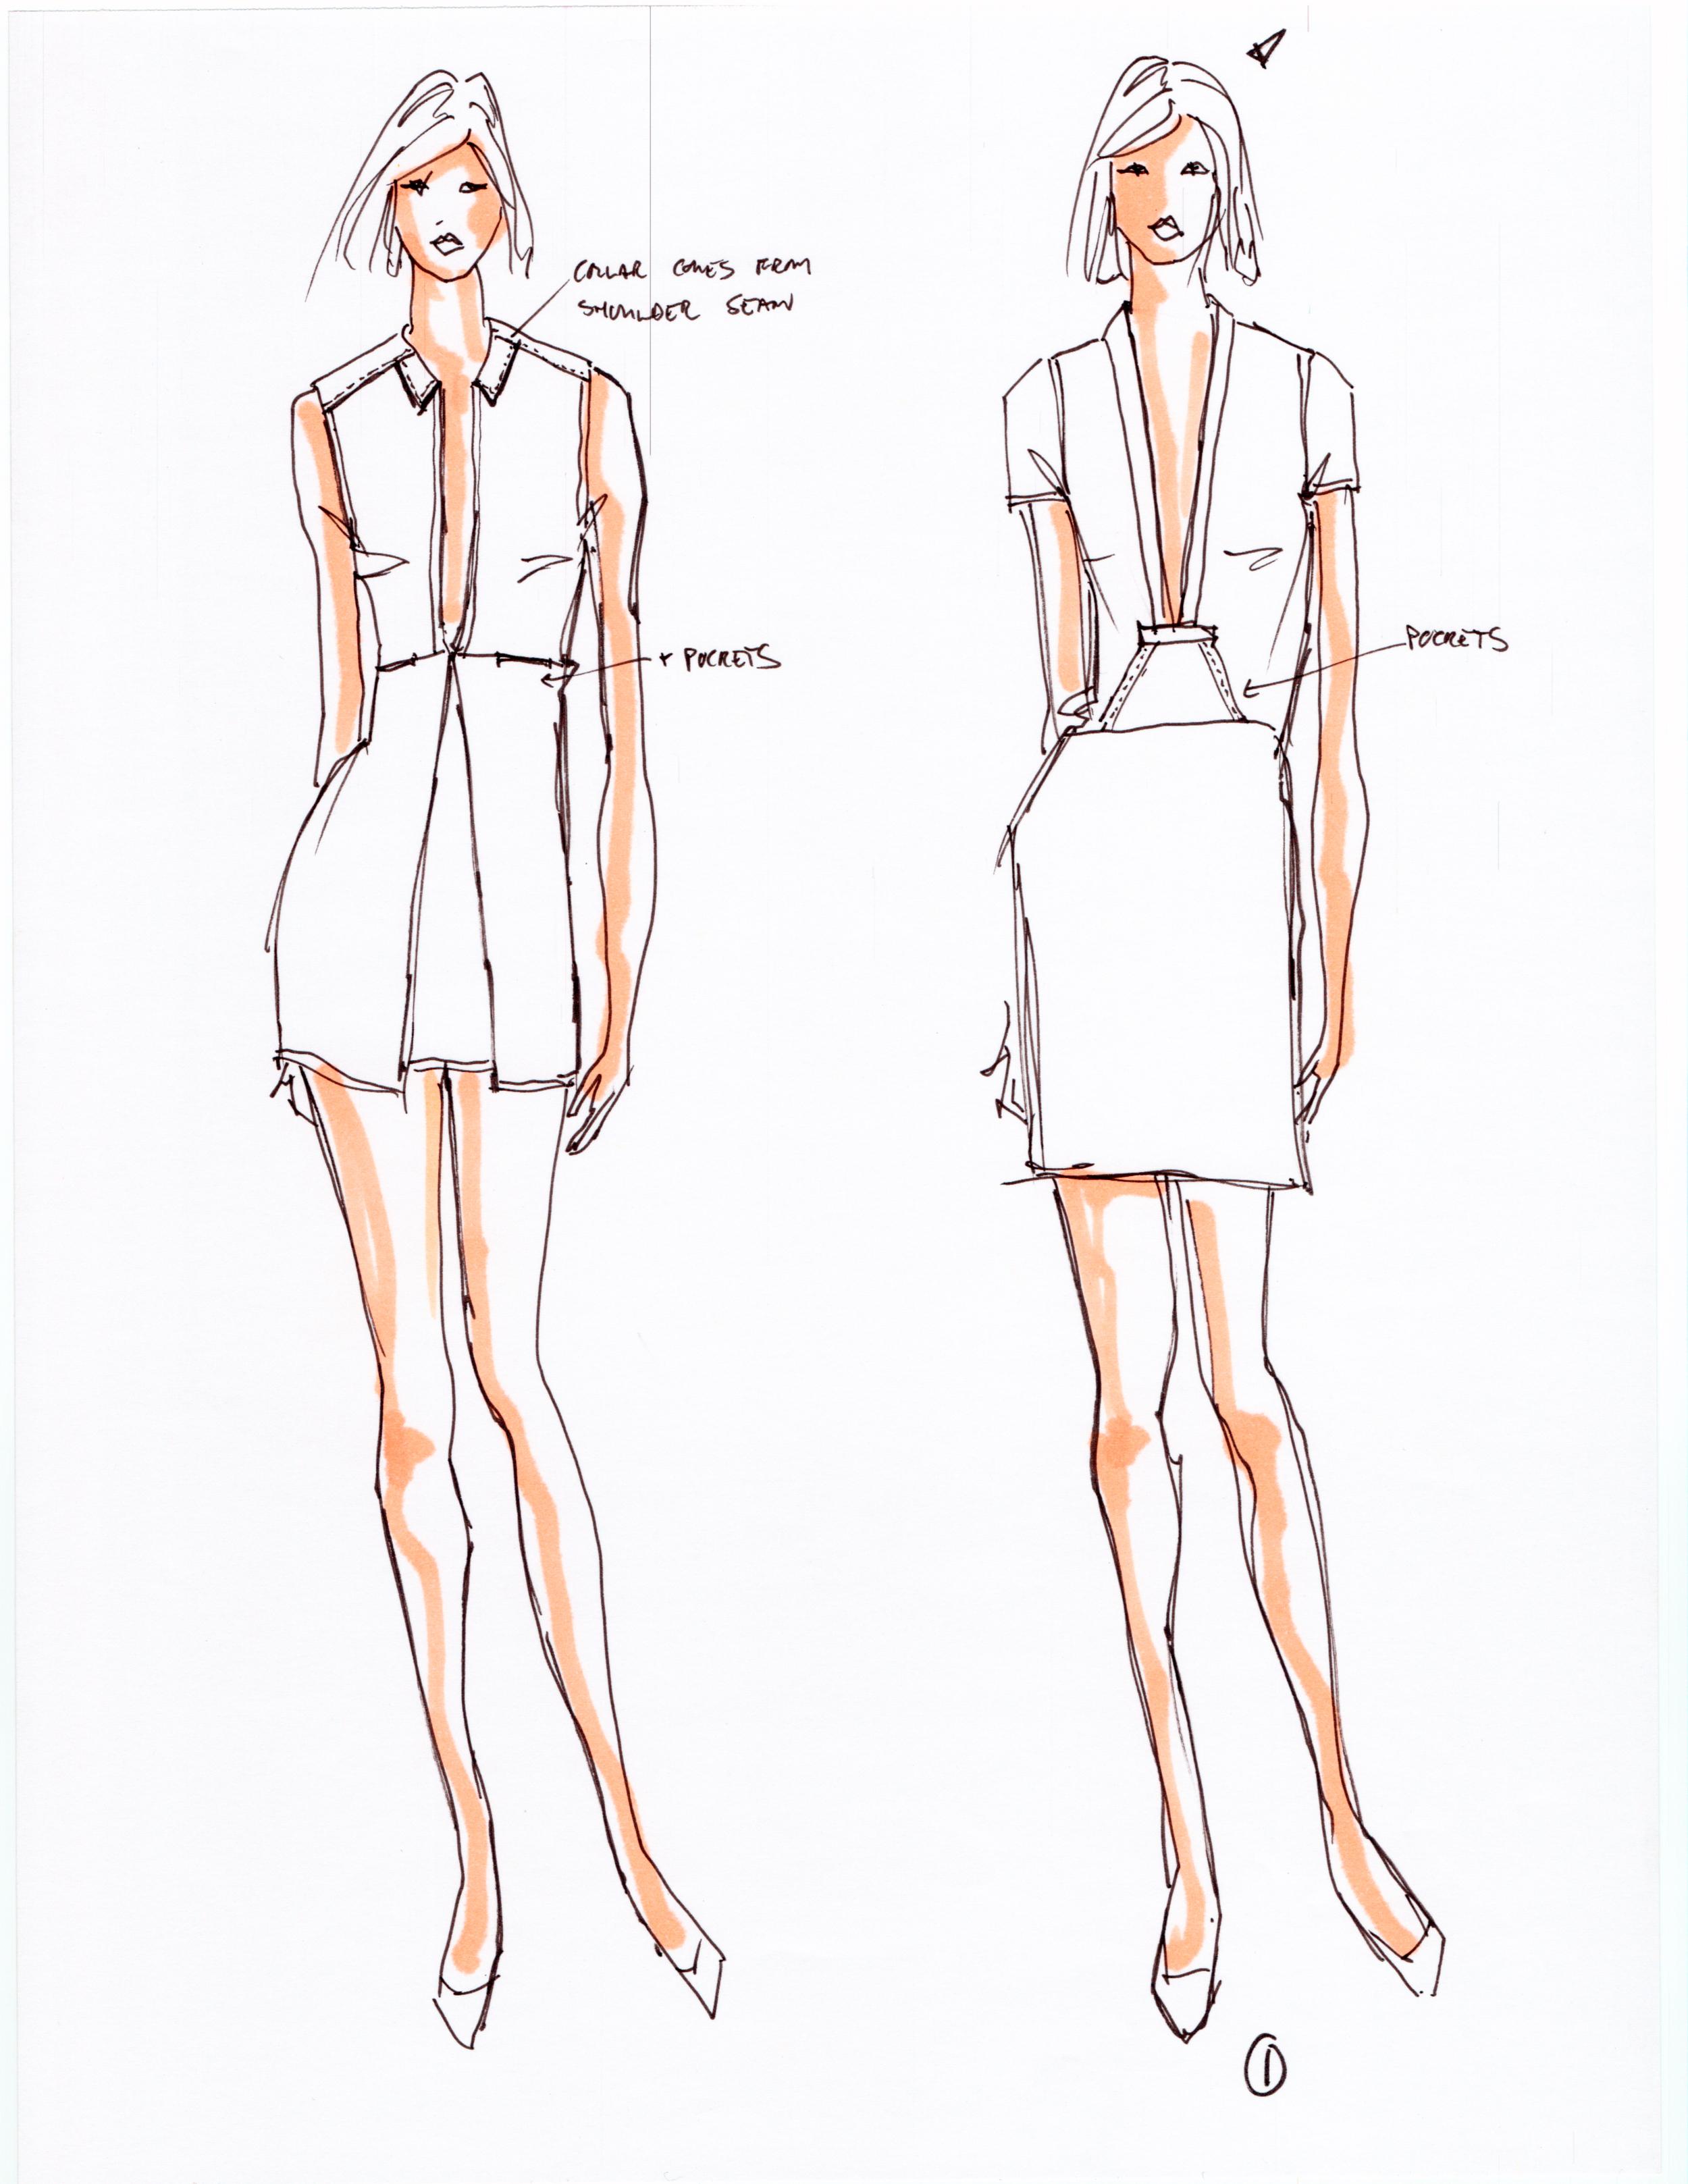 Dresses 3 Sketch 1.jpg